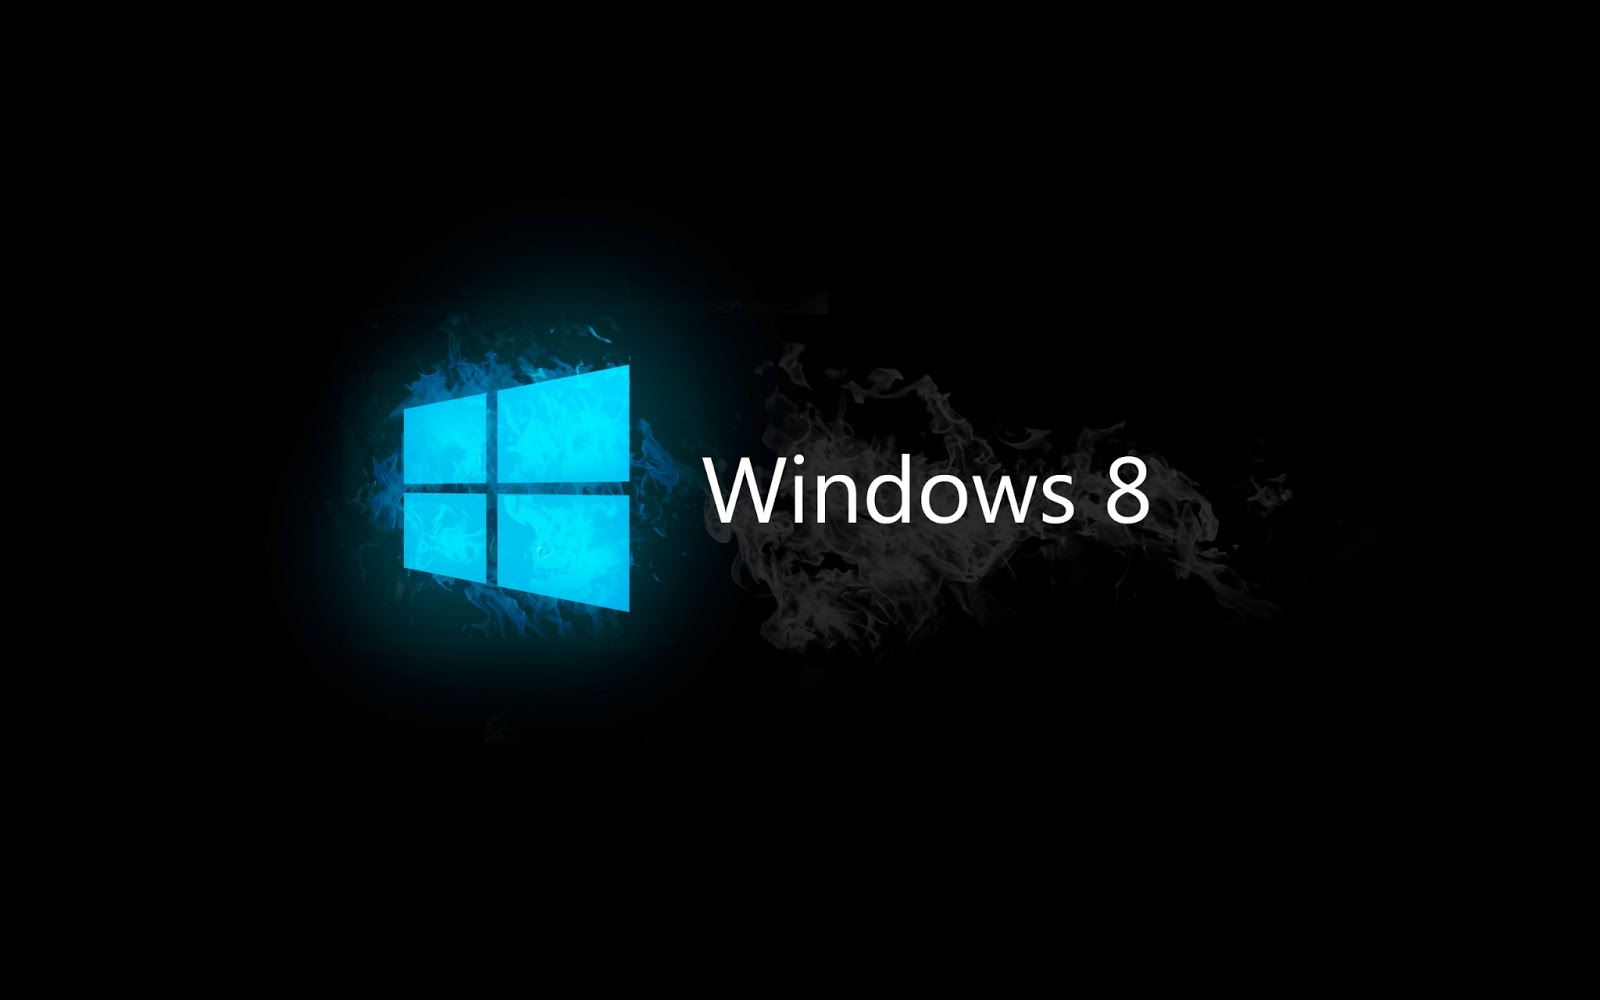 Top Windows 8 Hd wallpapers Free Download ~ Pakitlover.com ...